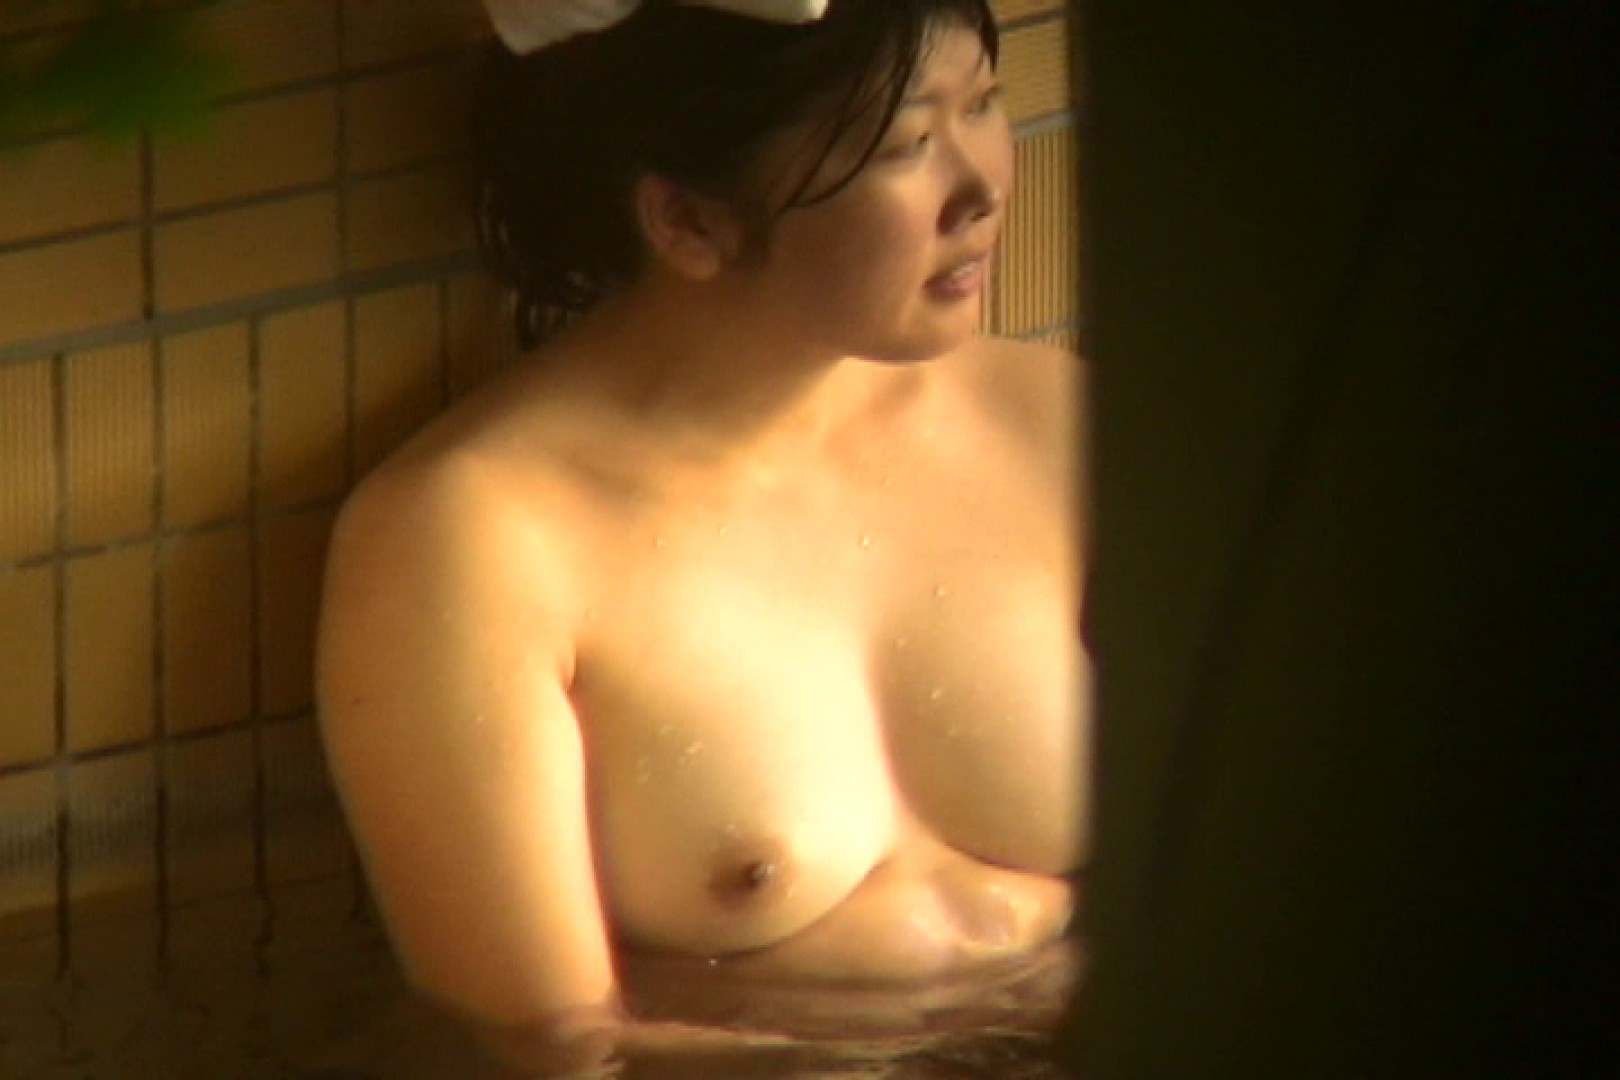 Aquaな露天風呂Vol.704 露天風呂編  93PIX 60